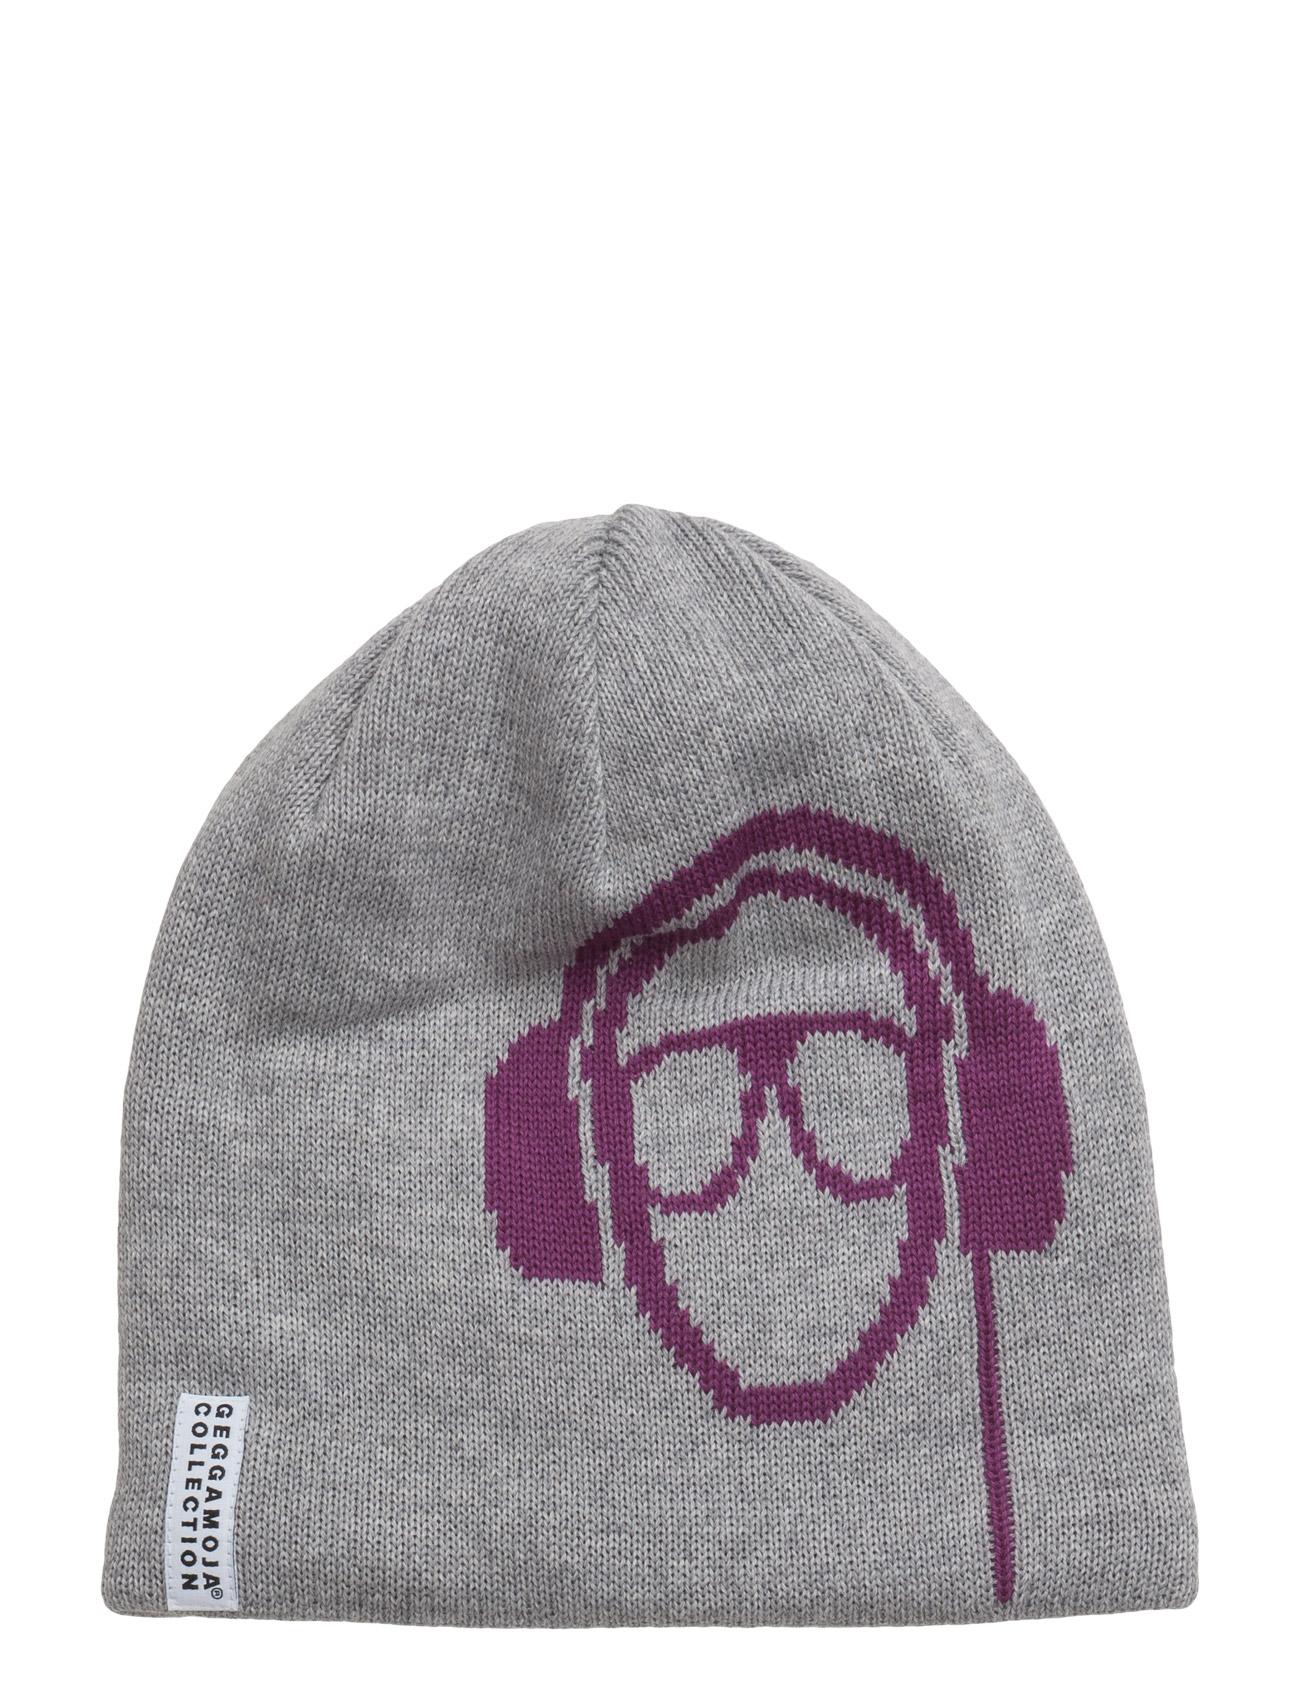 Headphone Beanie Geggamoja Hatte & Caps til Børn i